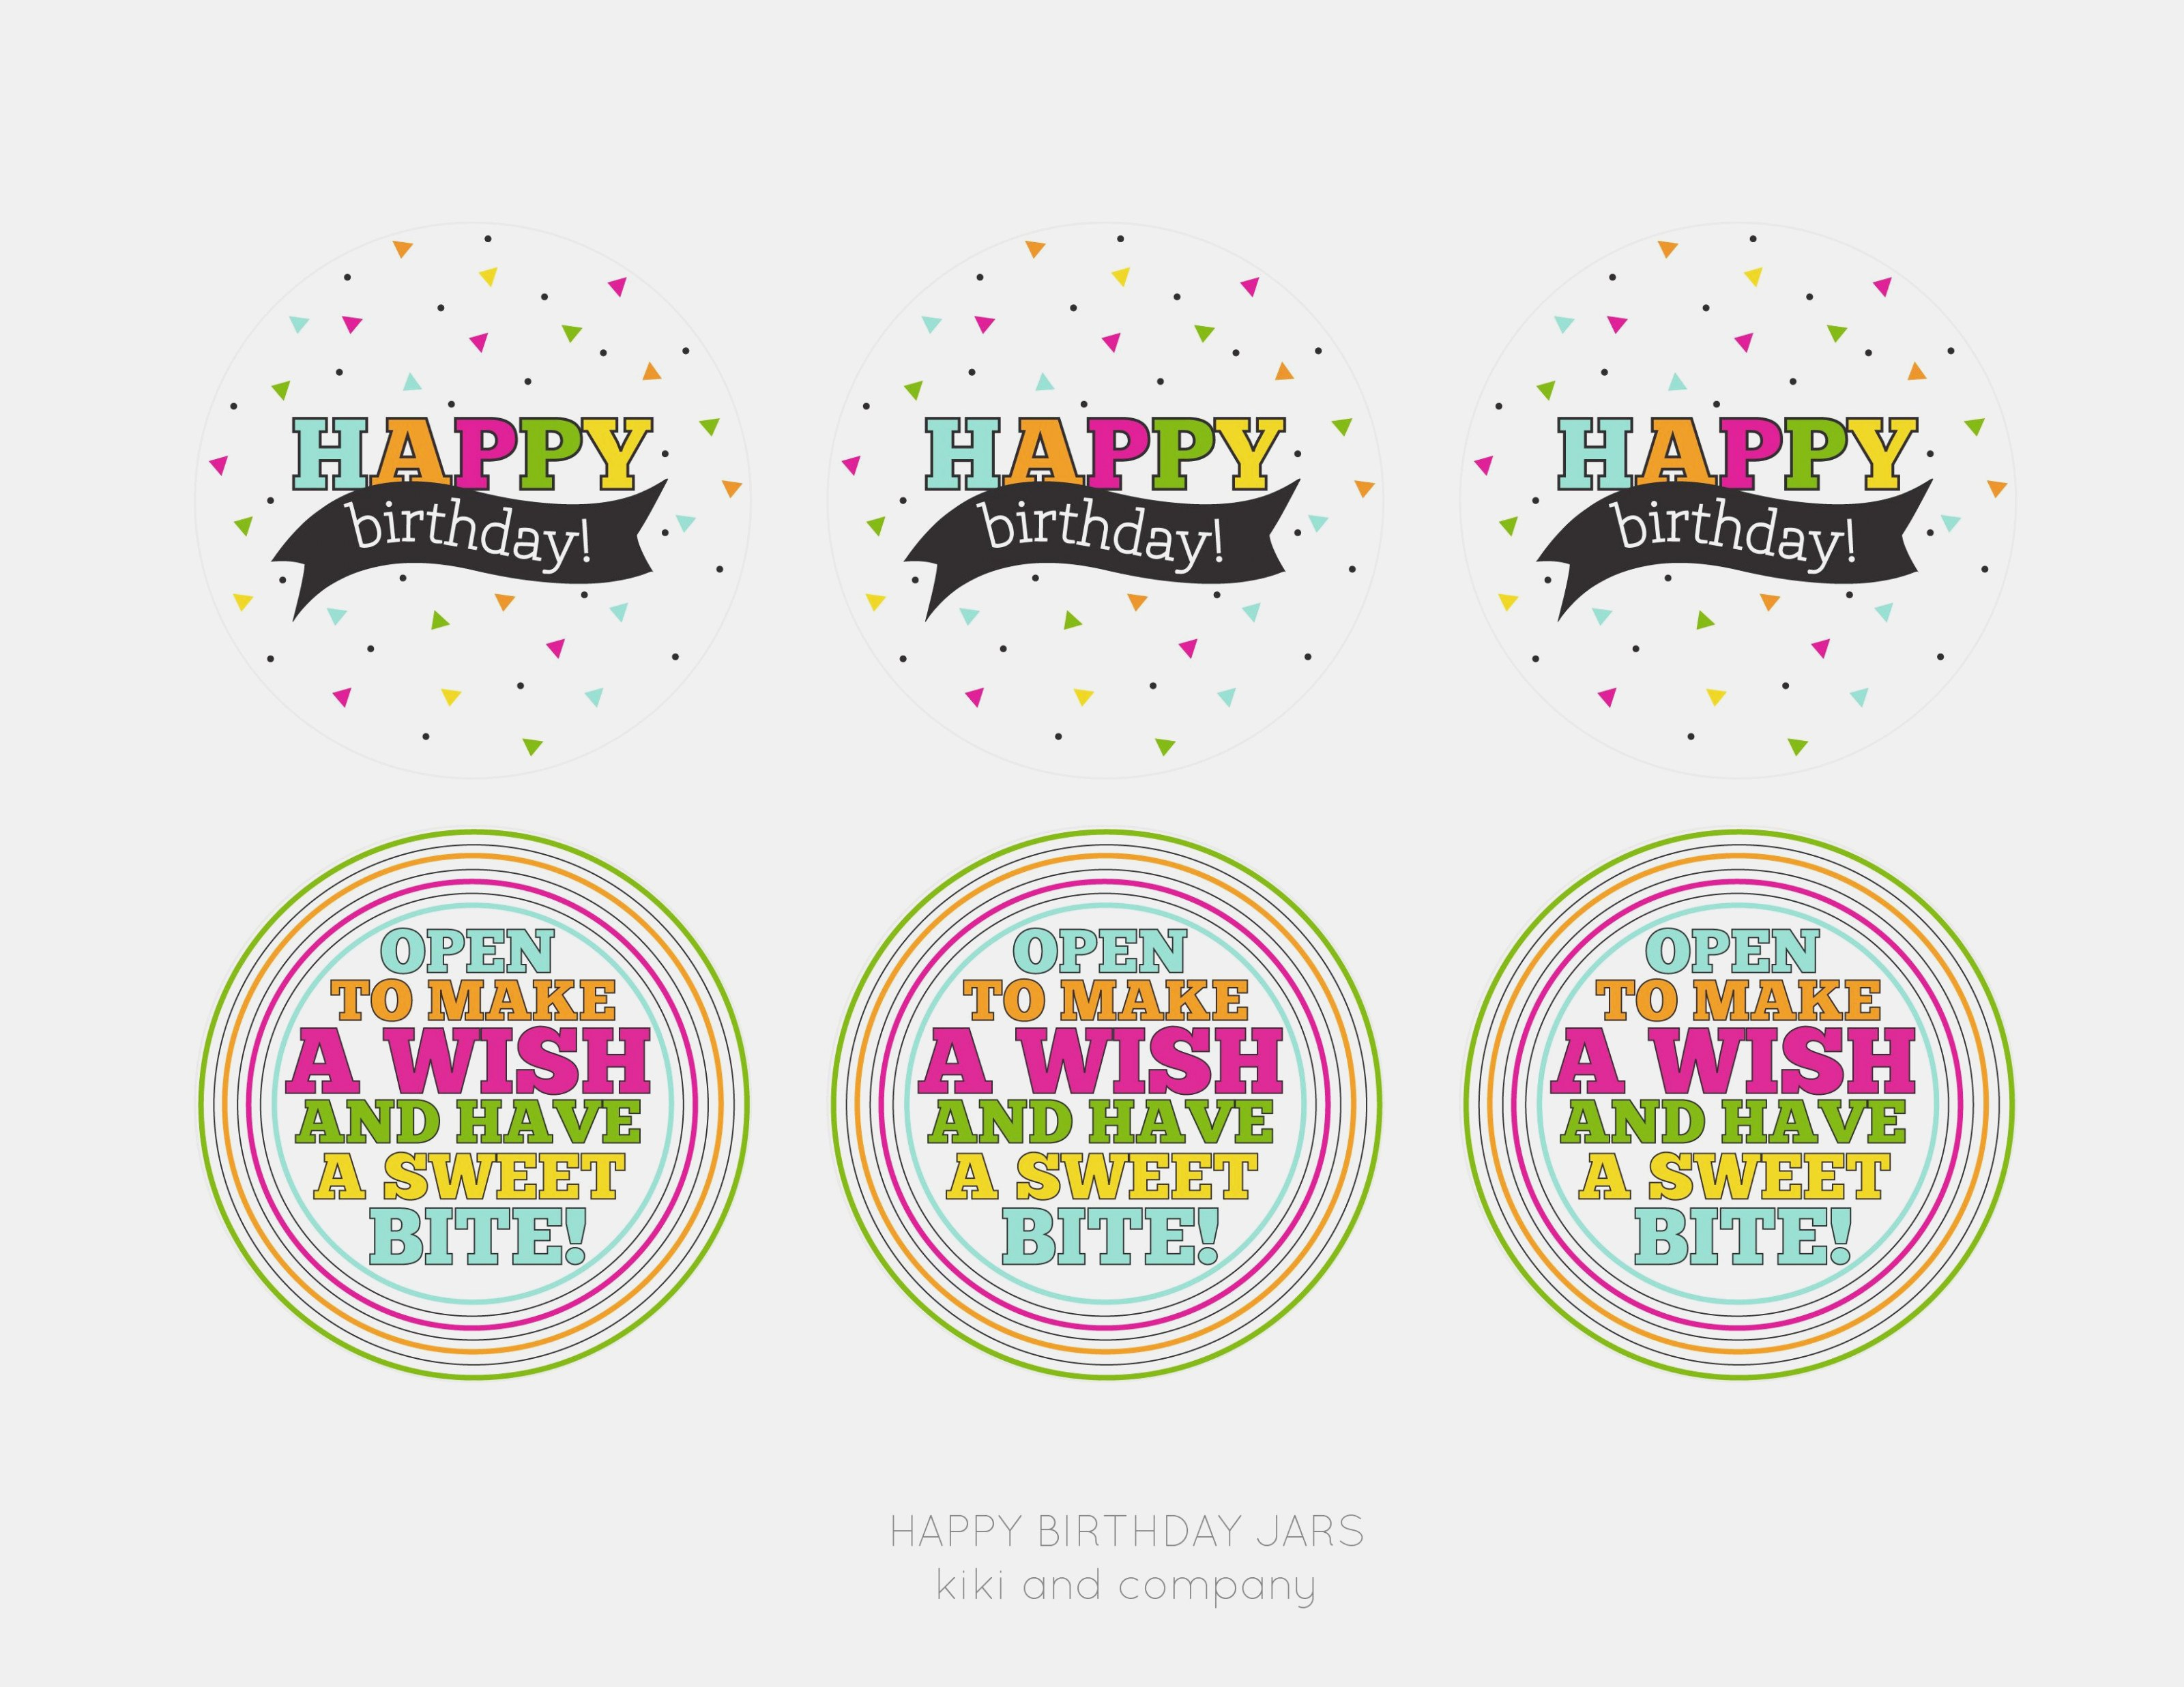 Birthday Labels Template New Happy Birthday Jar Free Printable Kiki With Birthday Labels Template Free